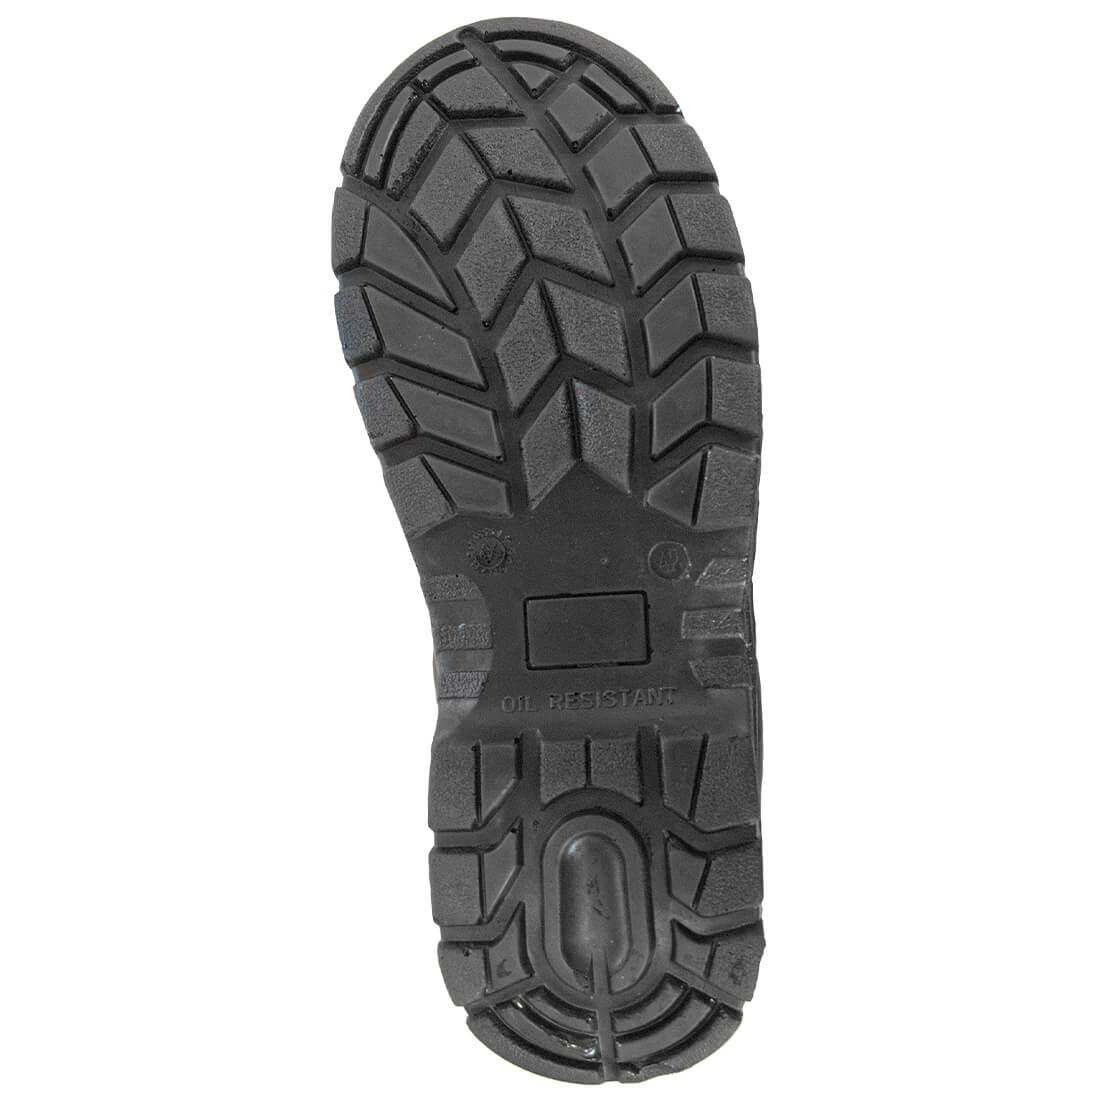 Pantof Compositelite™ Trouper S1 - Incaltaminte de protectie